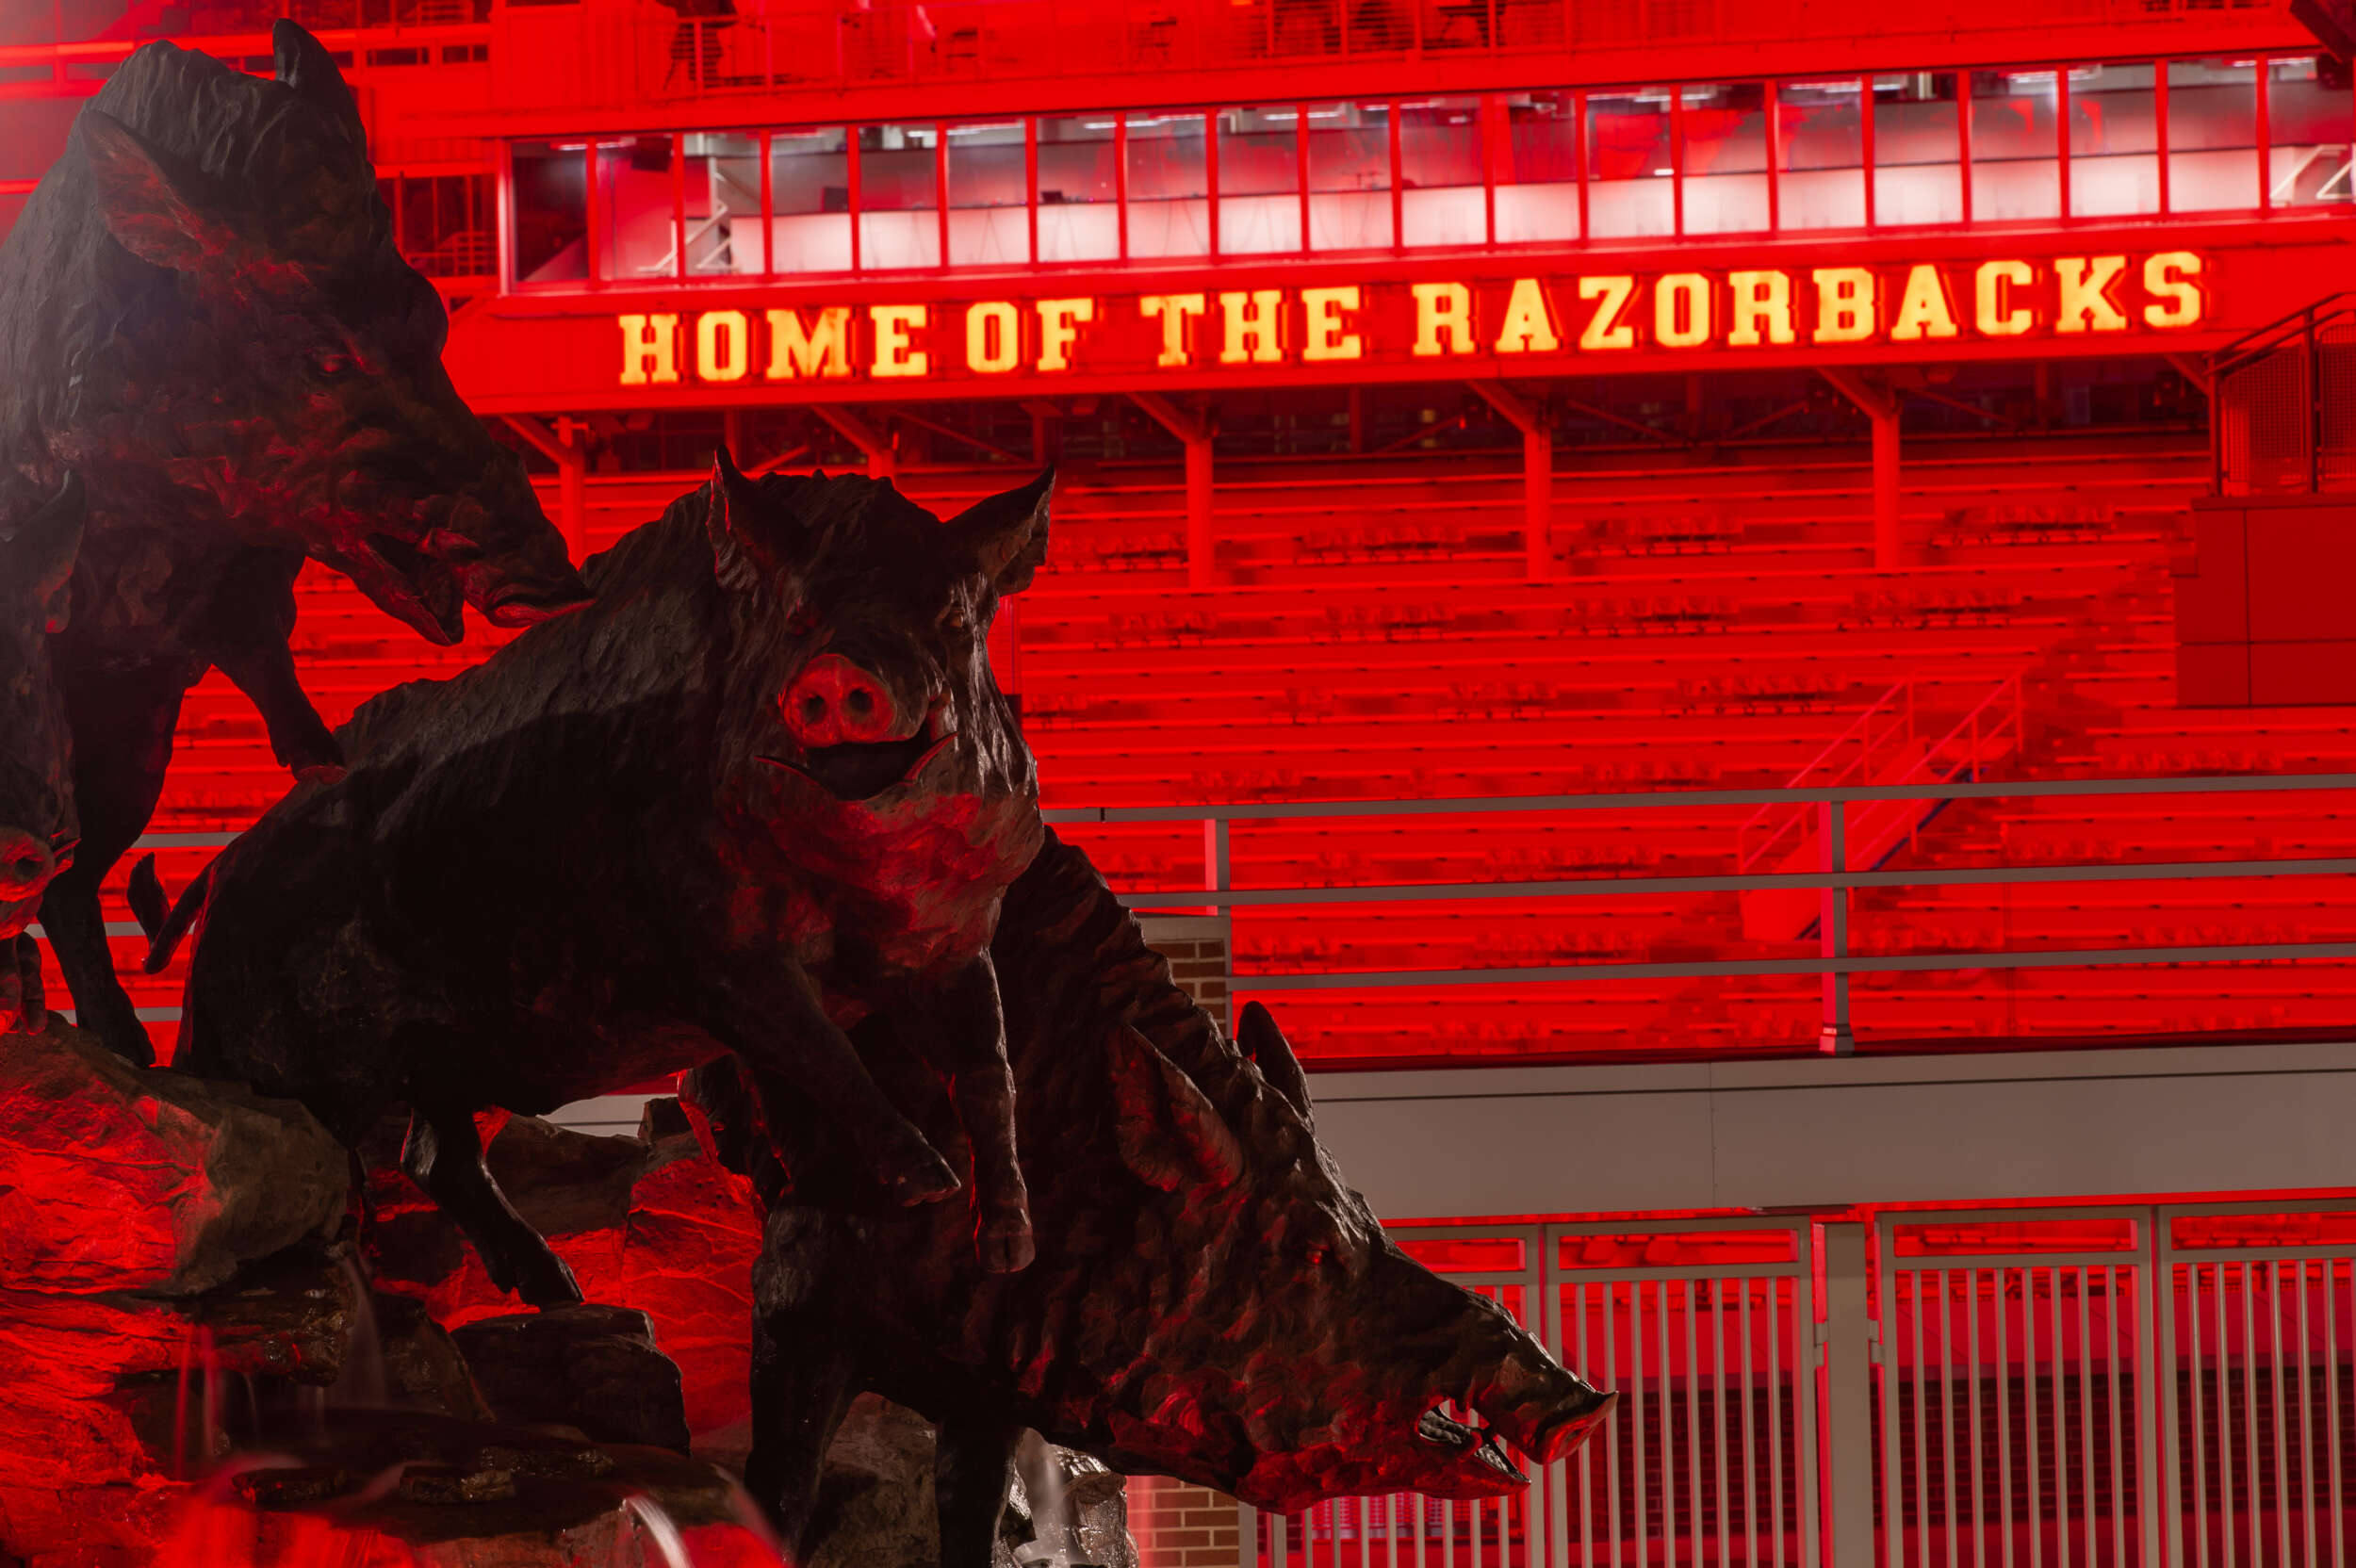 Razorbacks to travel to Missouri Dec. 5, Bama game TBA